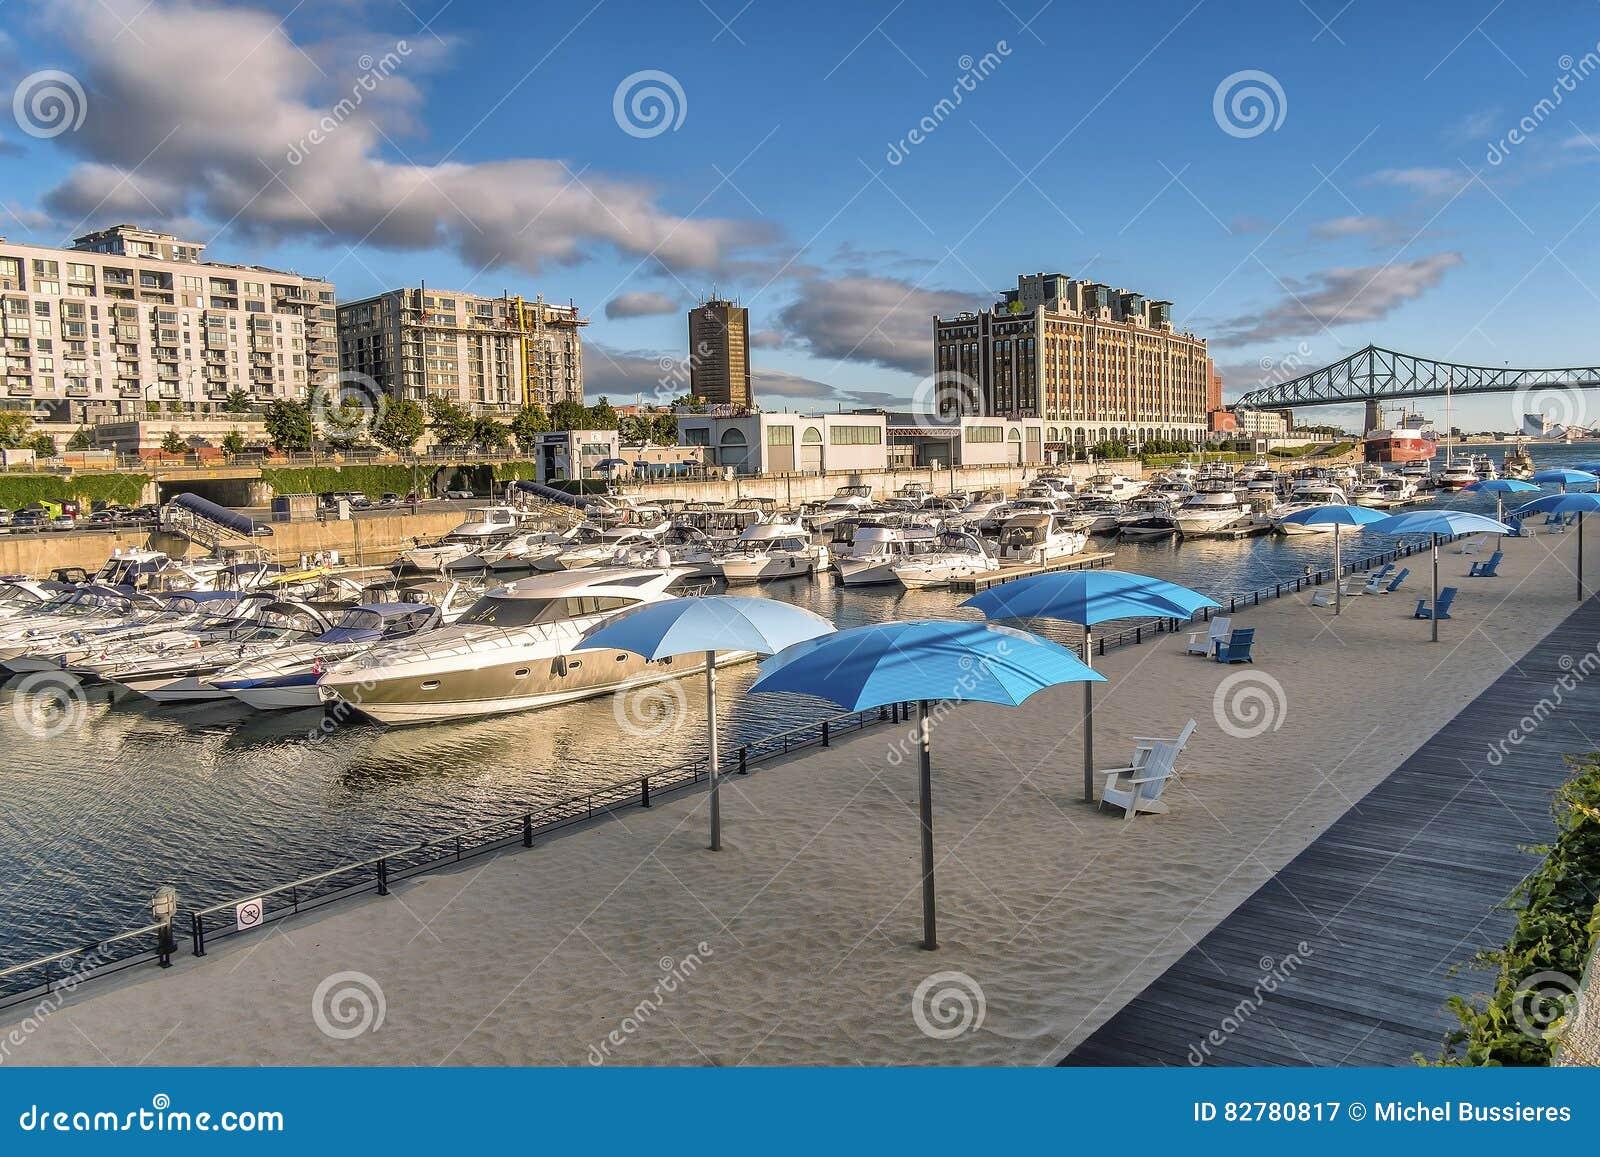 Montreal Old Port scene